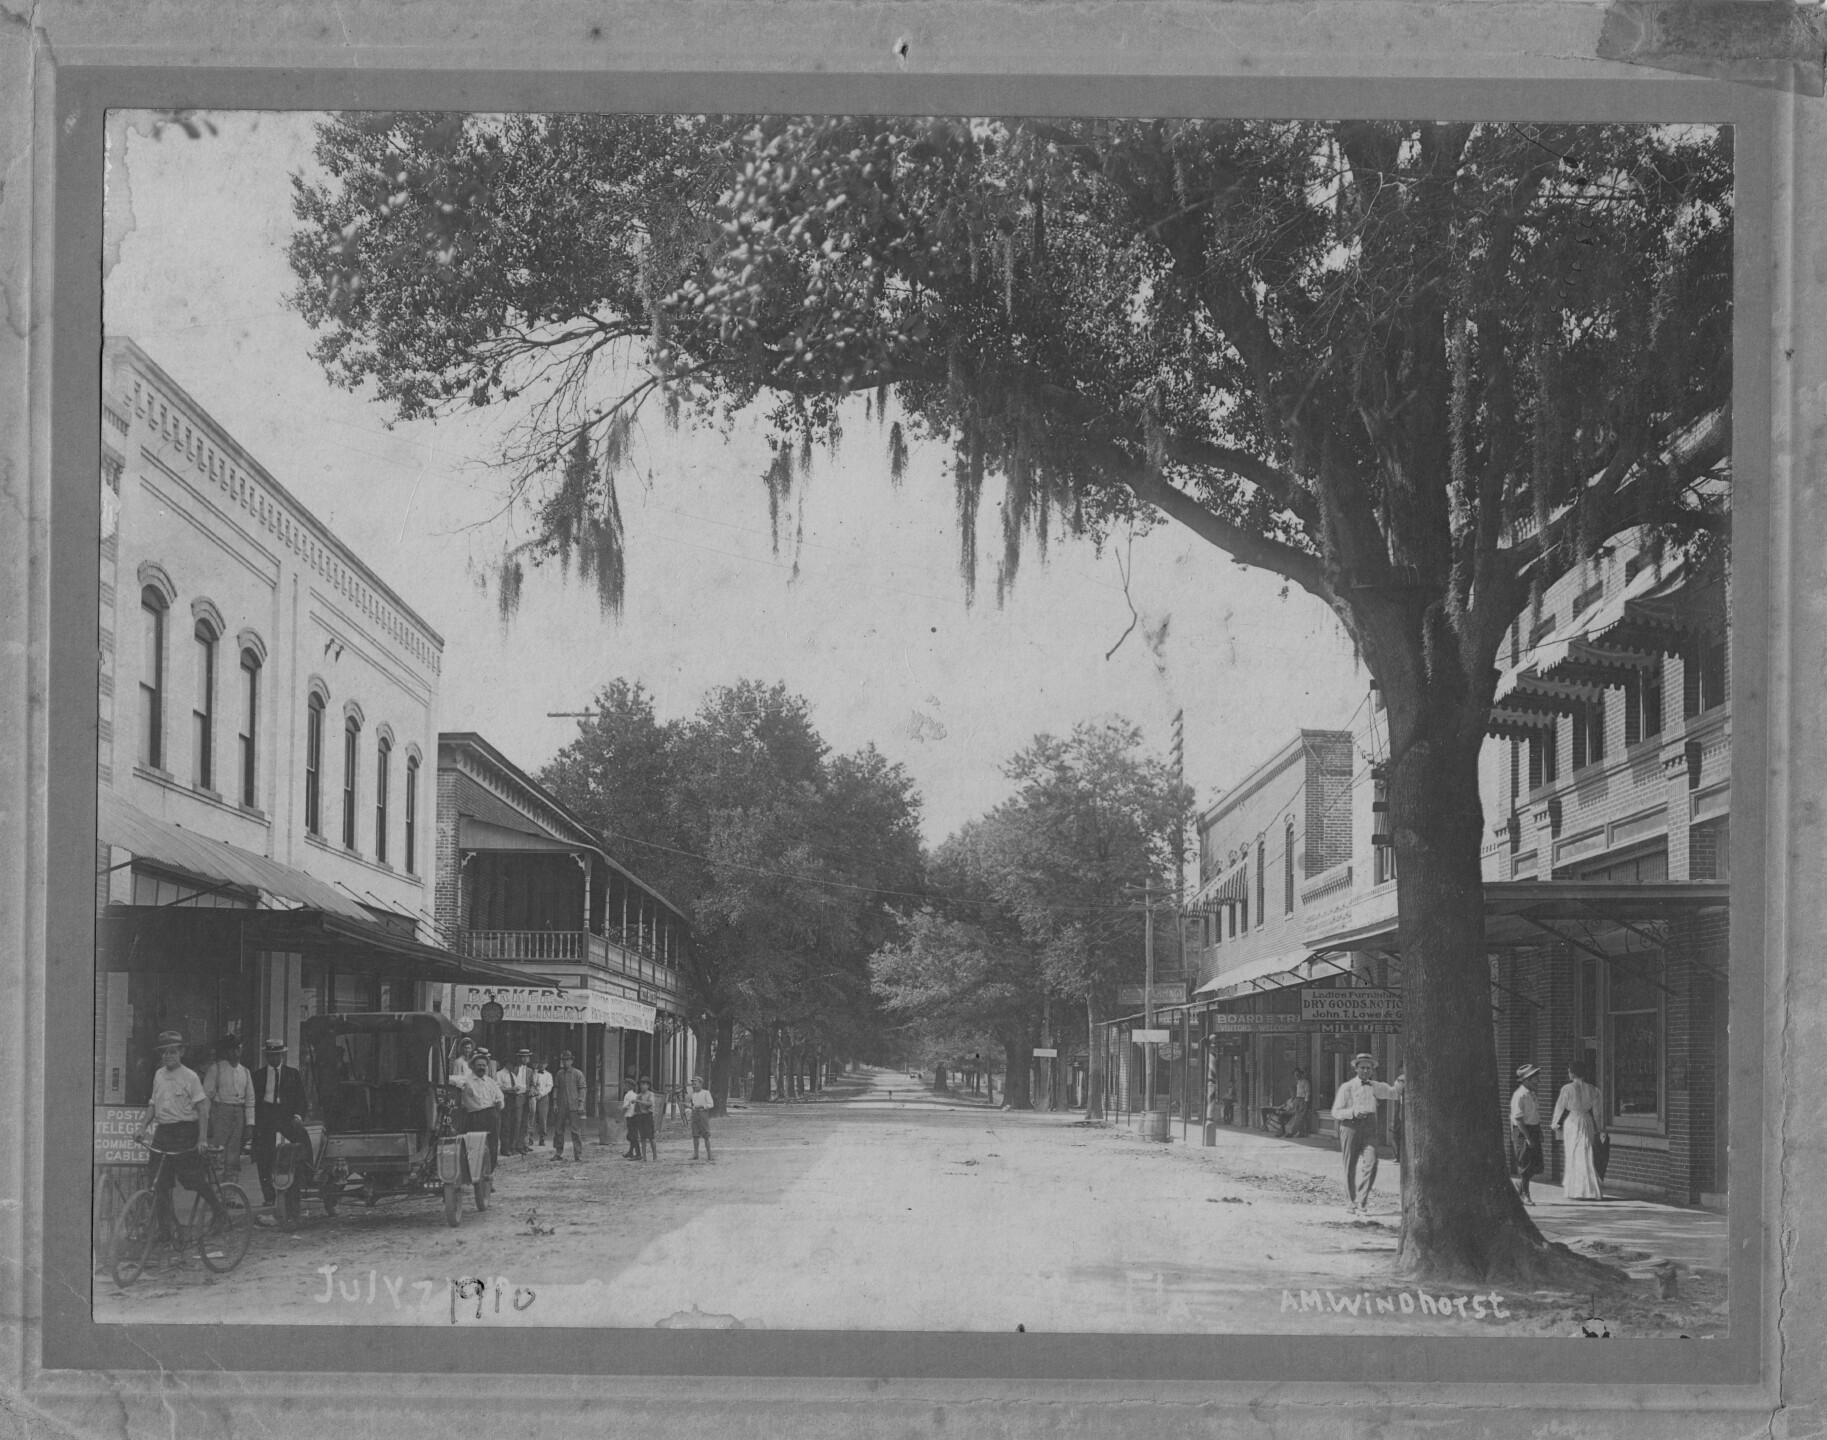 PLANT CITY DOWNTOWN COLLINS STREET 1910.jpg